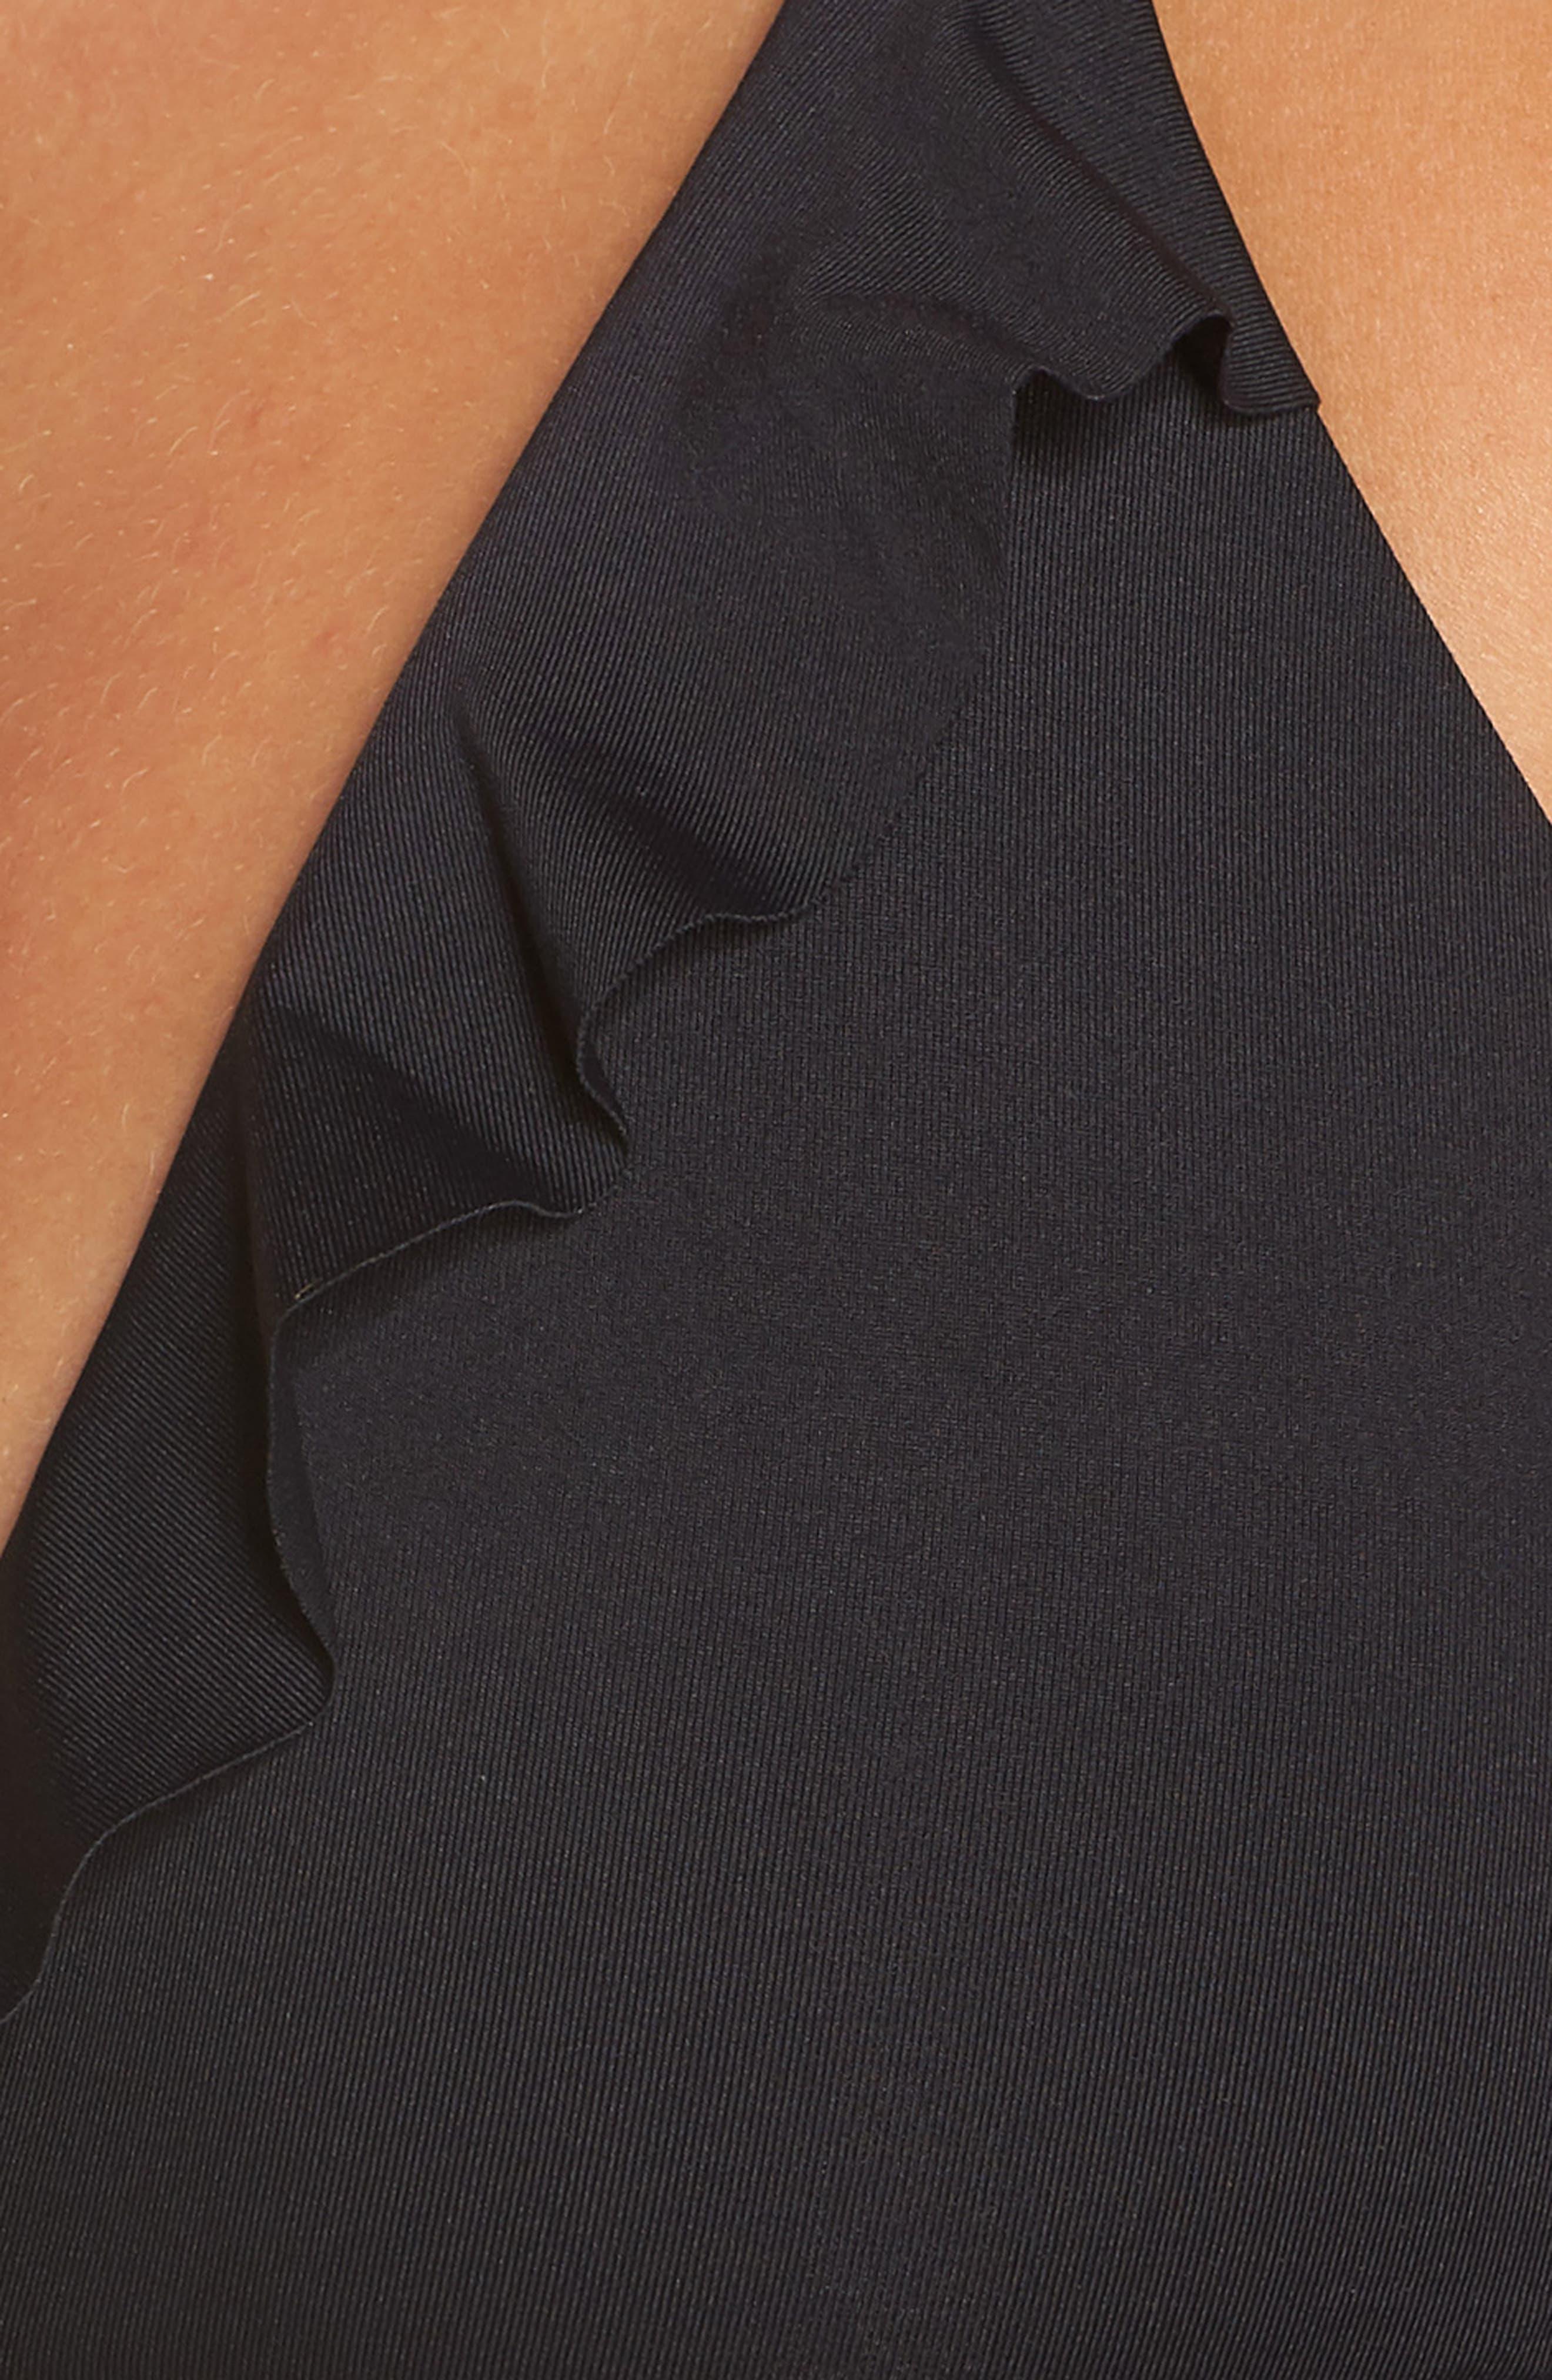 Socialite Ruffle Bikini Top,                             Alternate thumbnail 5, color,                             BLACK